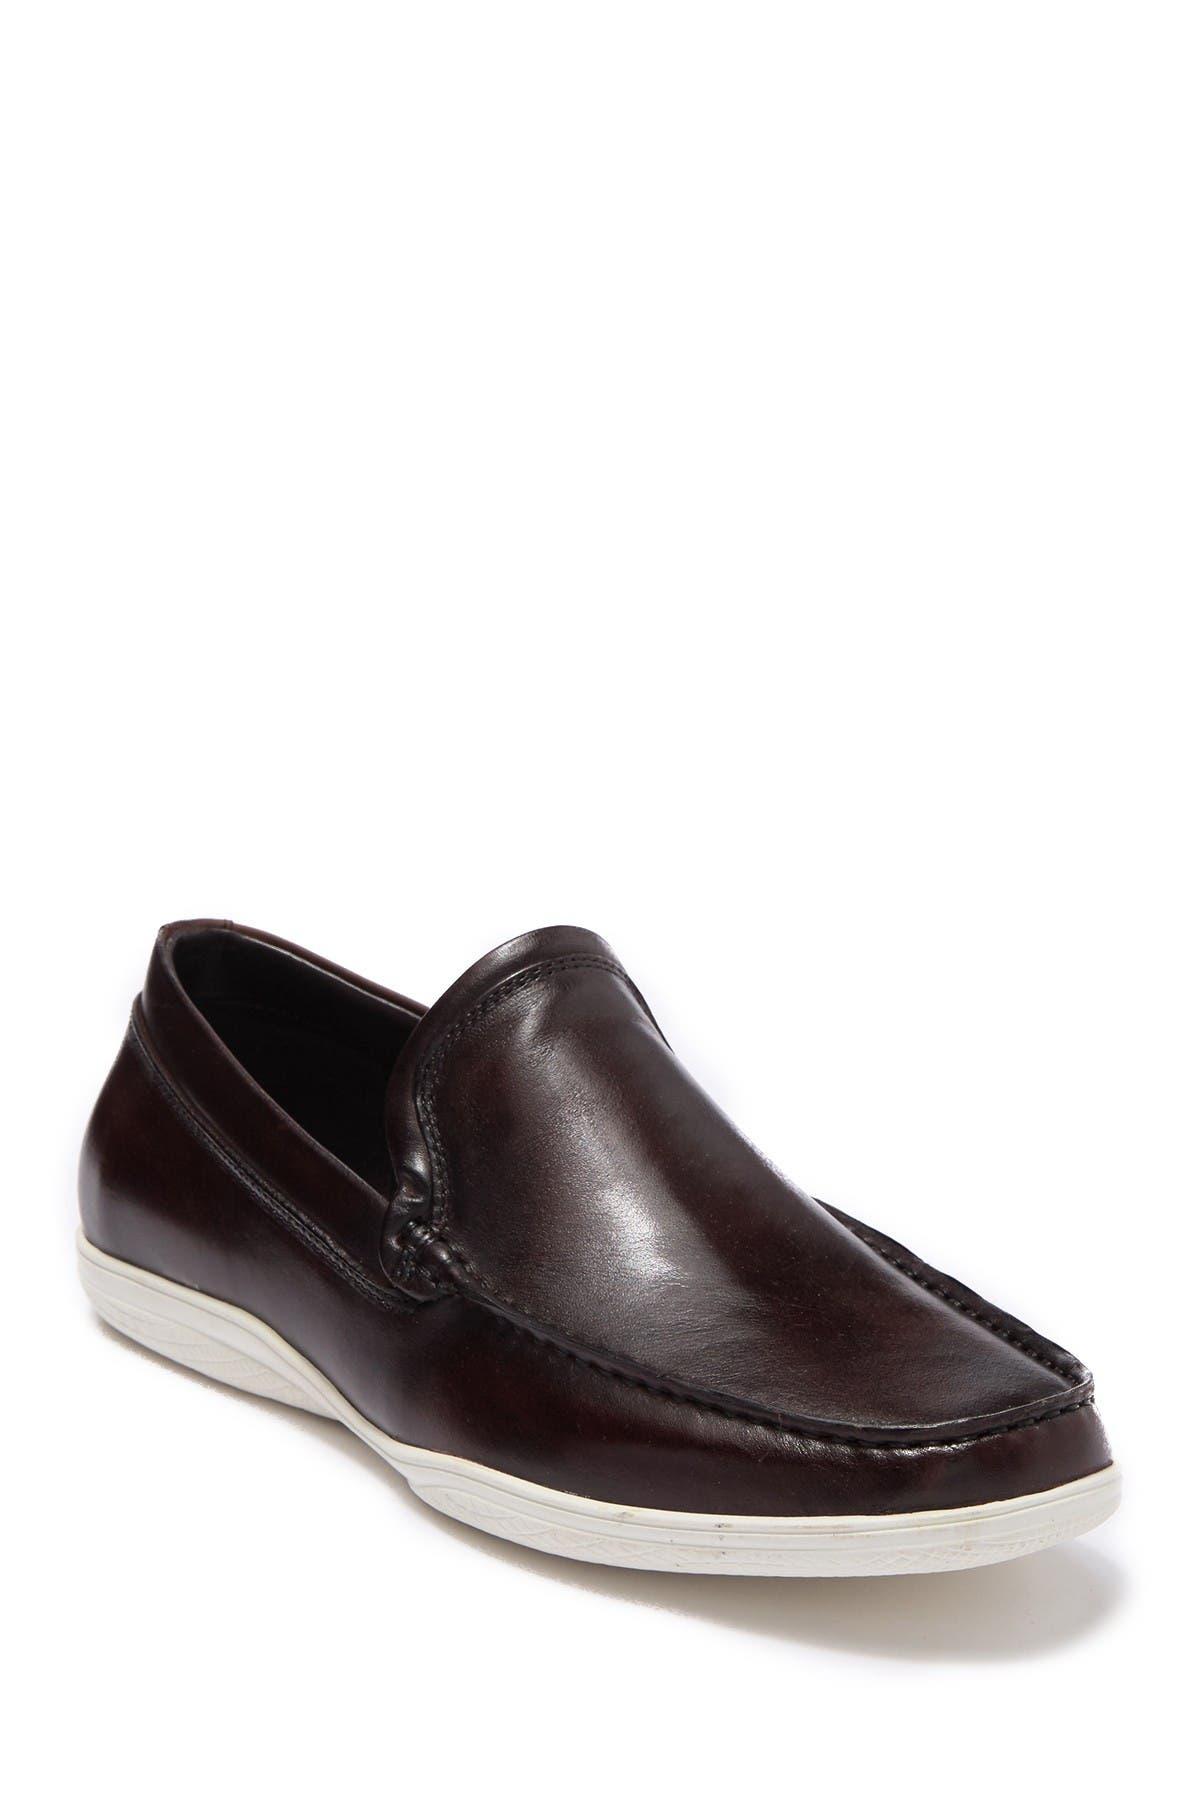 Image of Kenneth Cole Reaction Design Leather Loafer